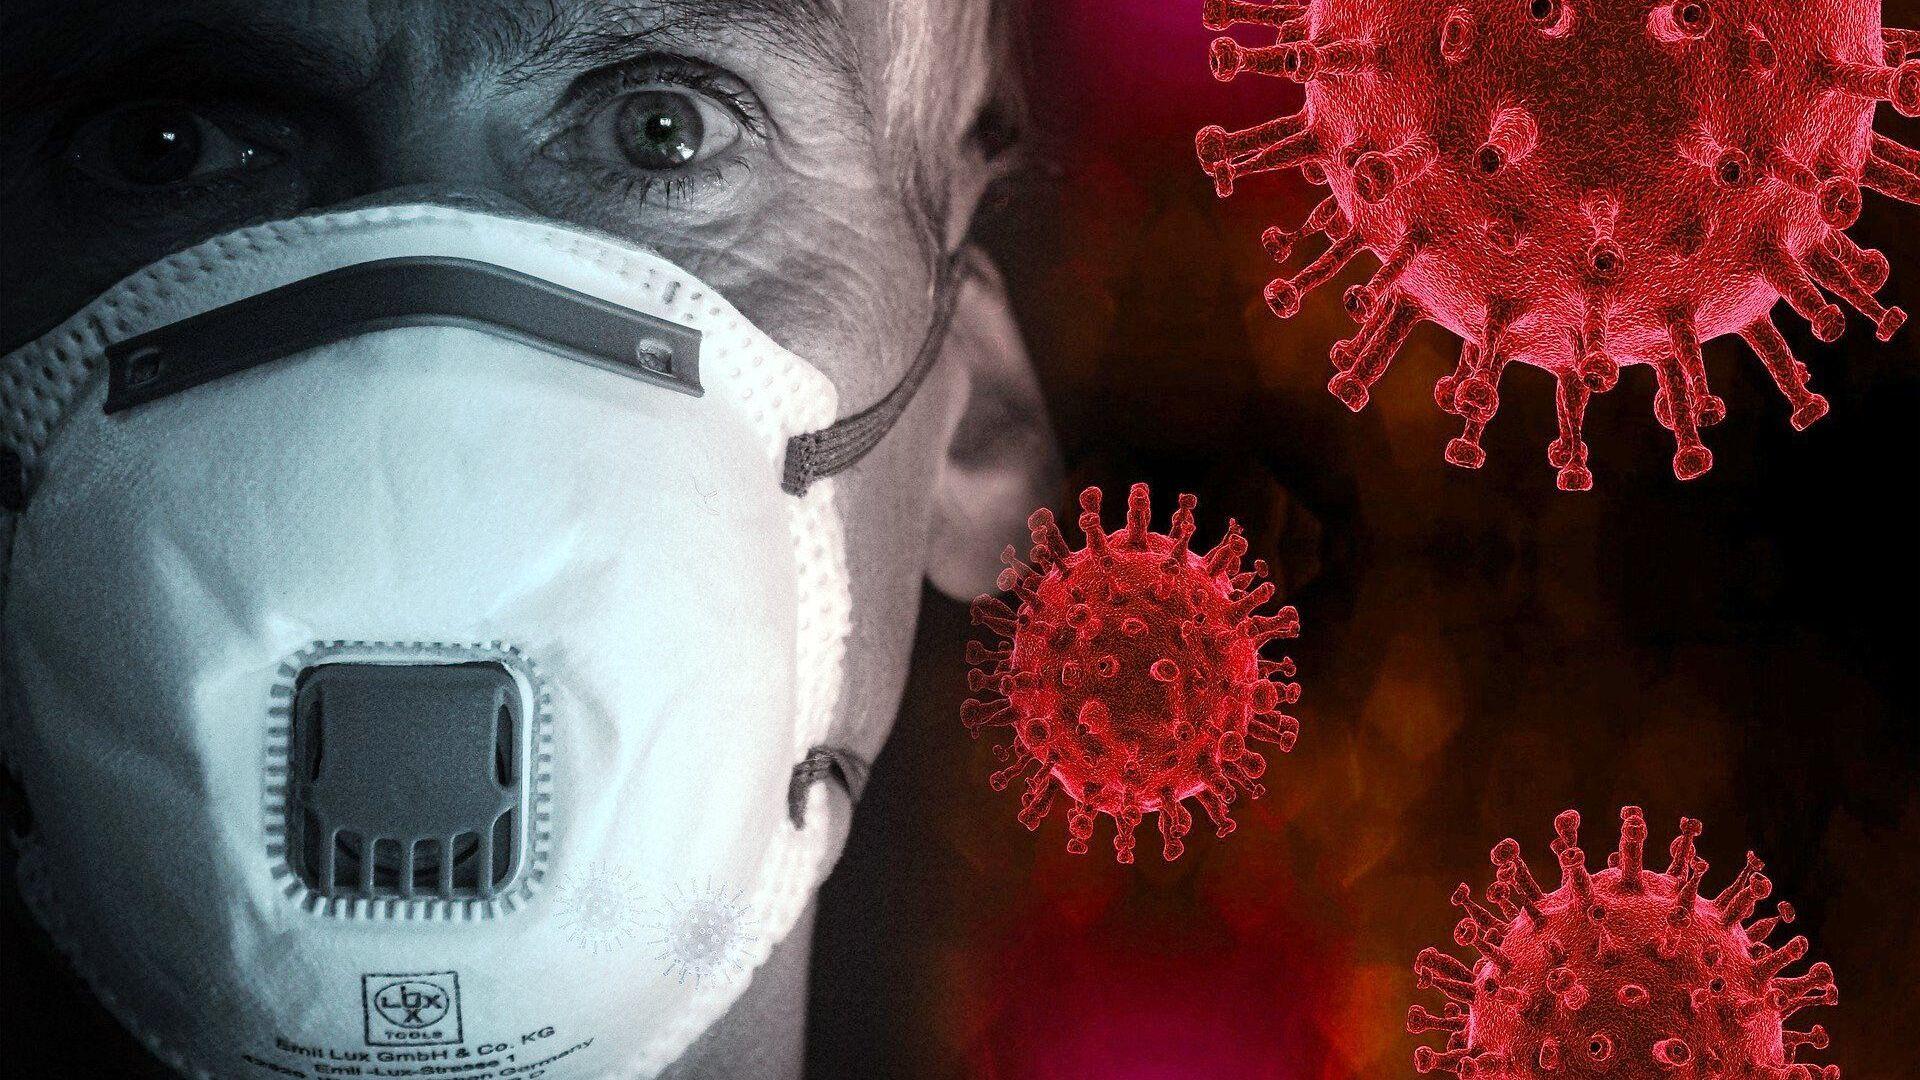 Virus 2021 - Sputnik International, 1920, 09.09.2021